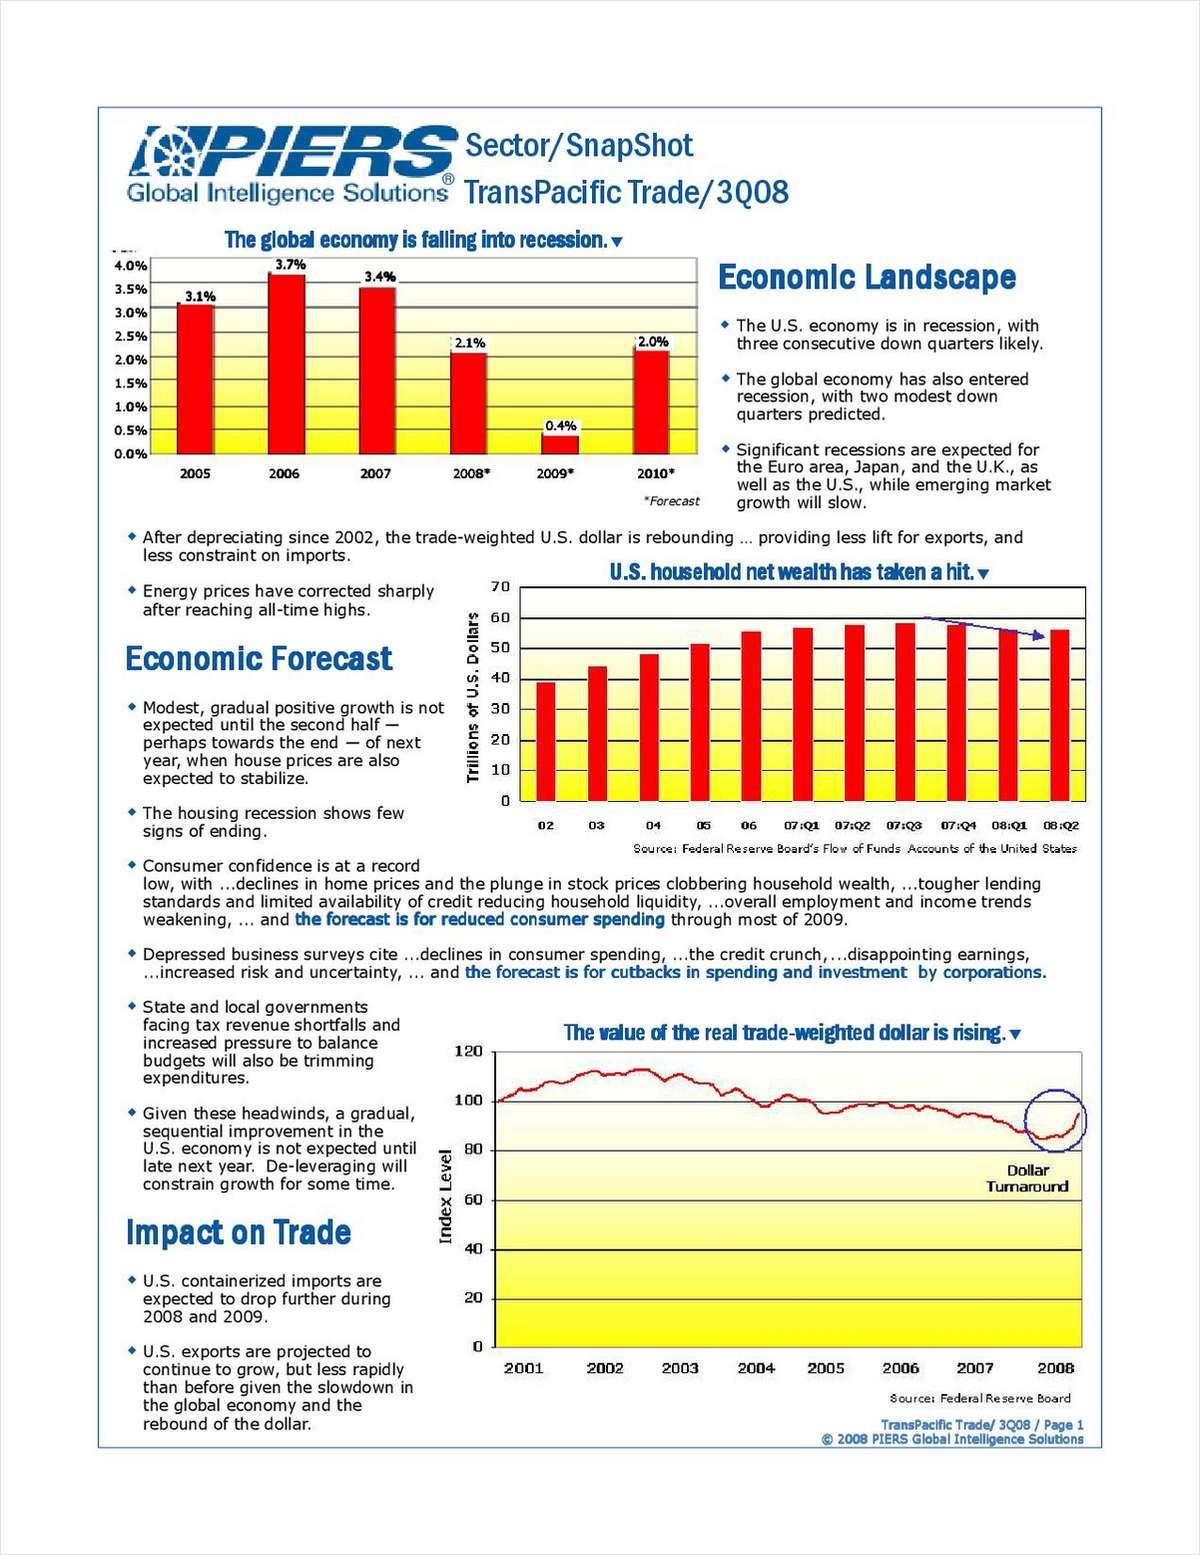 PIERS Sector SnapShot - TransPacific Trade